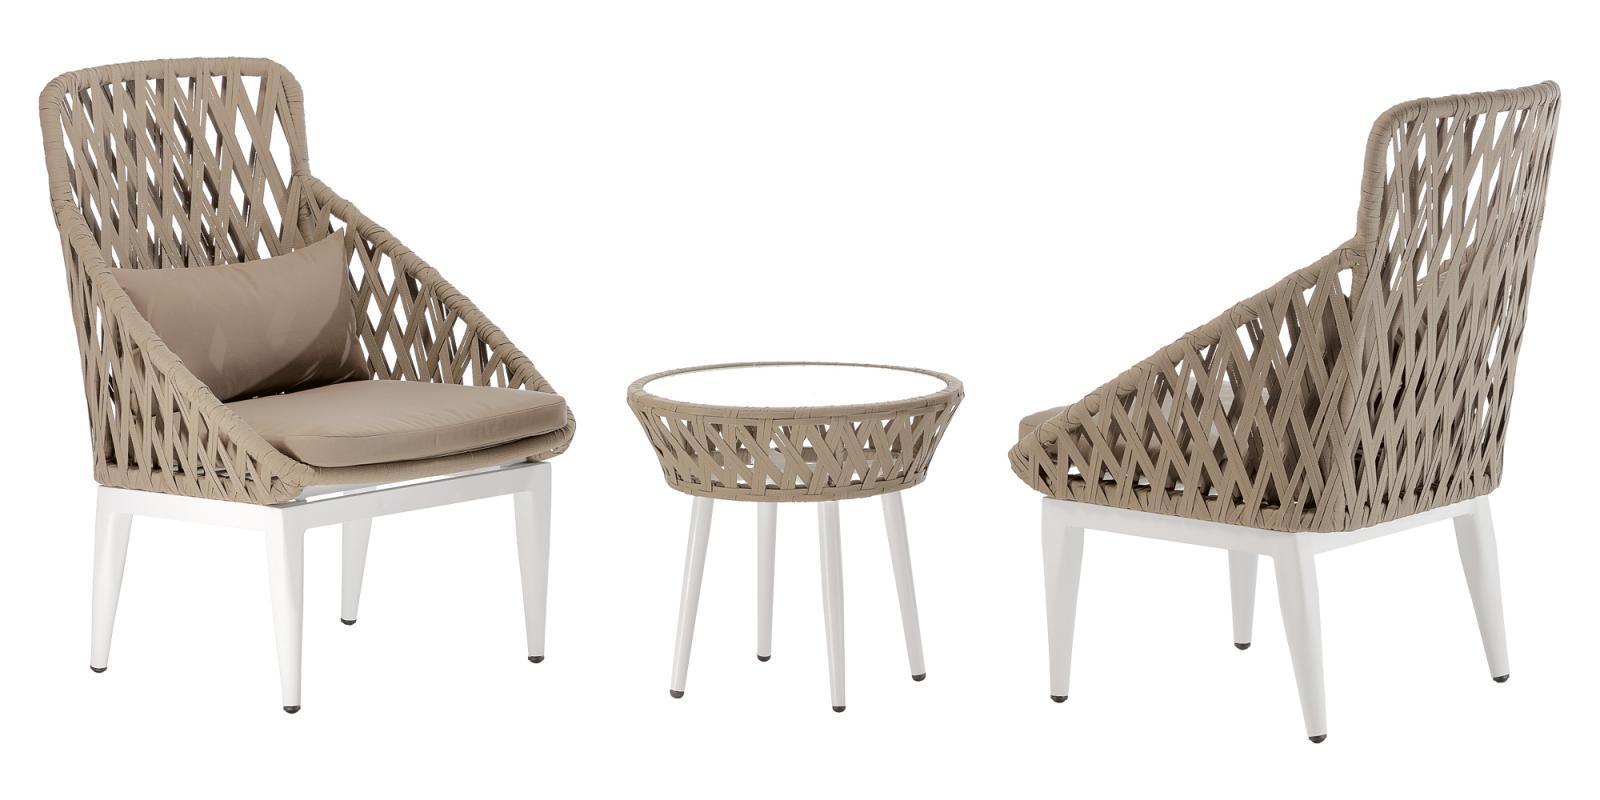 Комплект мебели Formentera